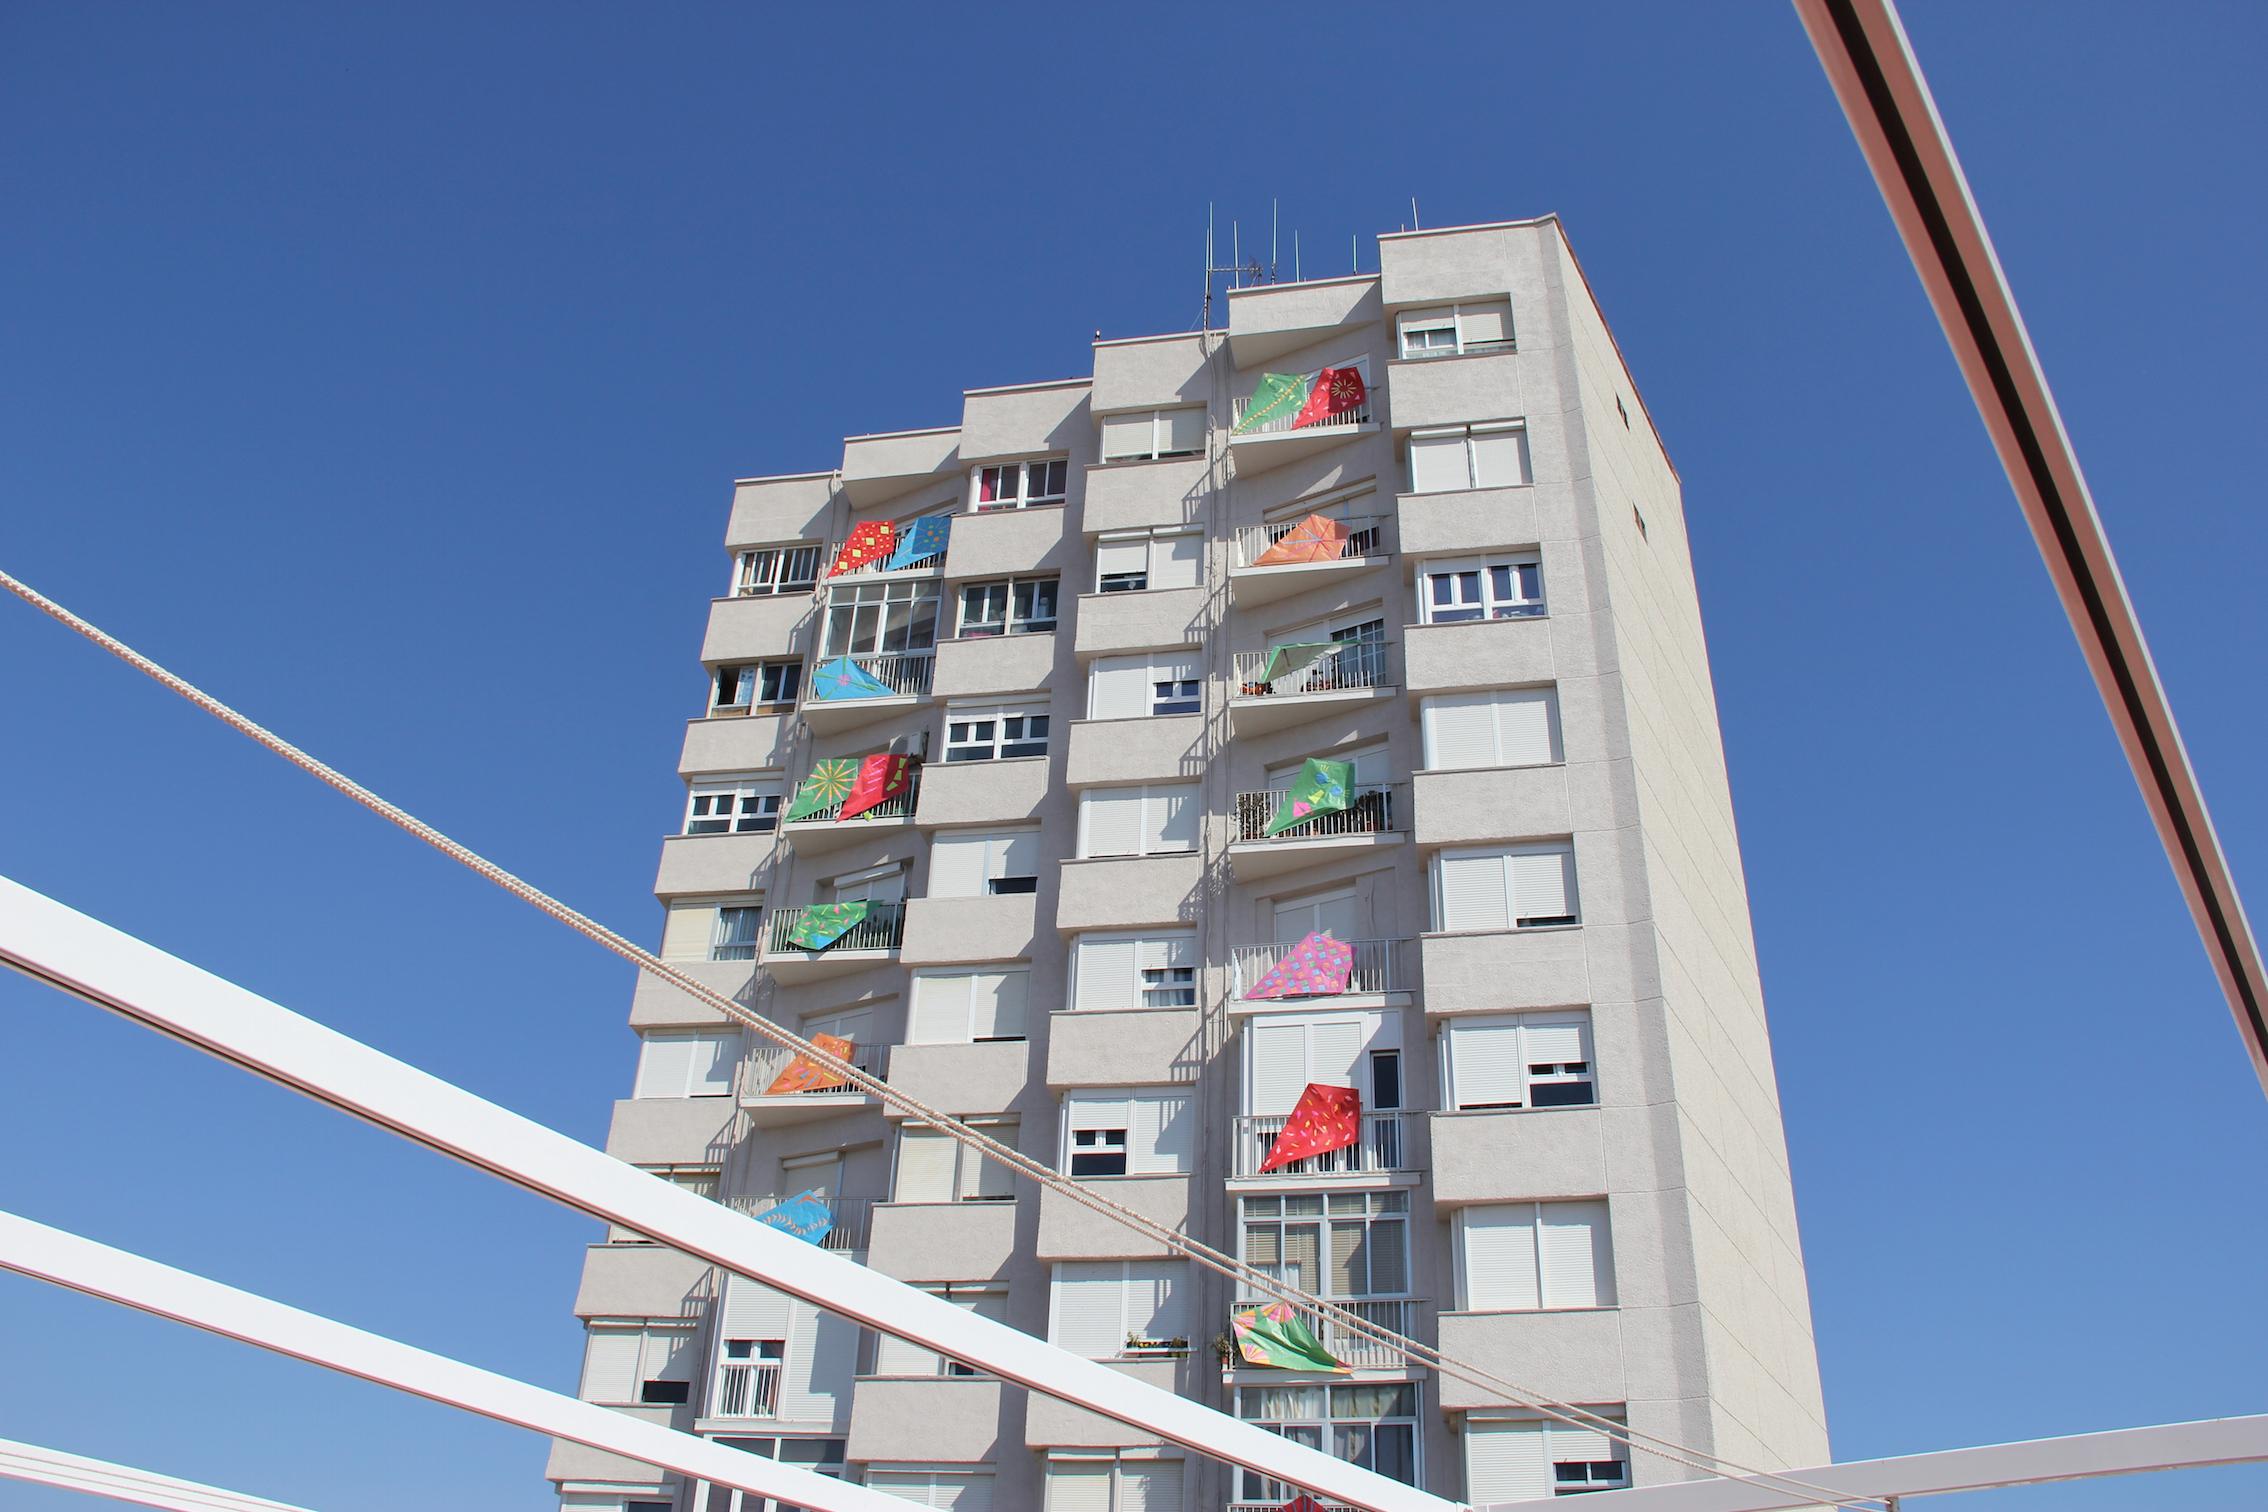 Gift 7 (Tower Block)